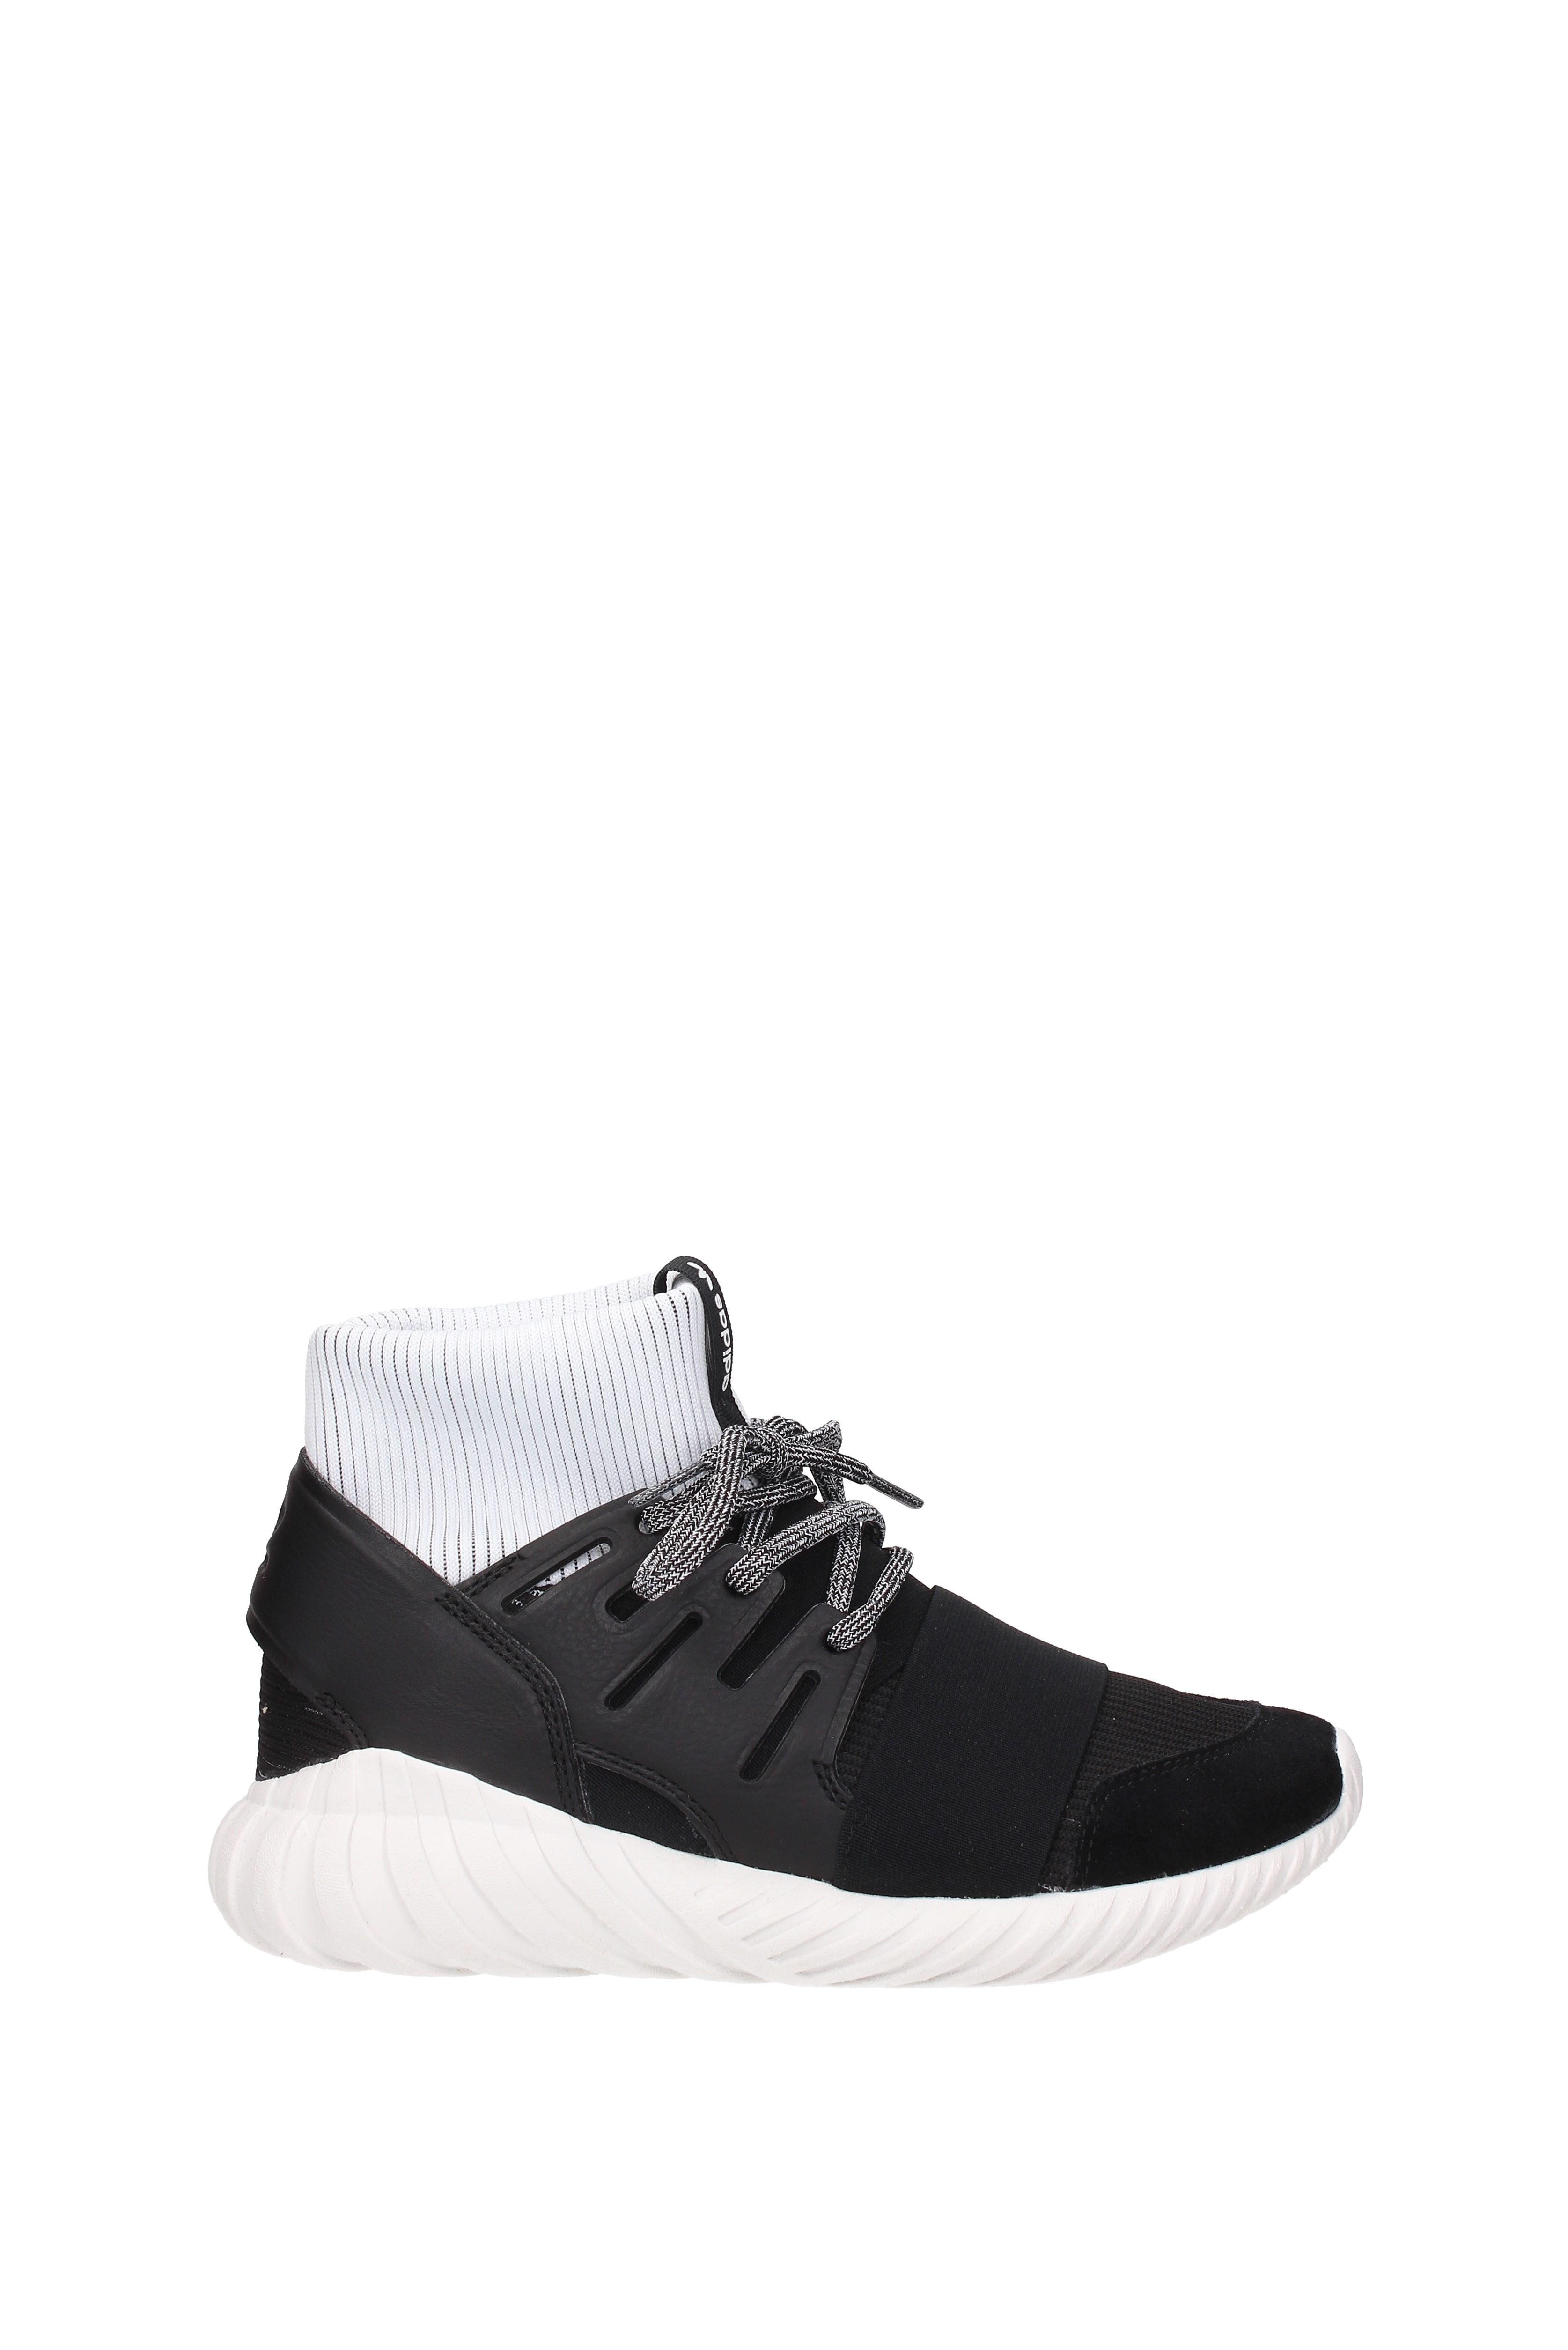 Sneakers-Adidas-tubular-doom-Herren-Stoff-BA755